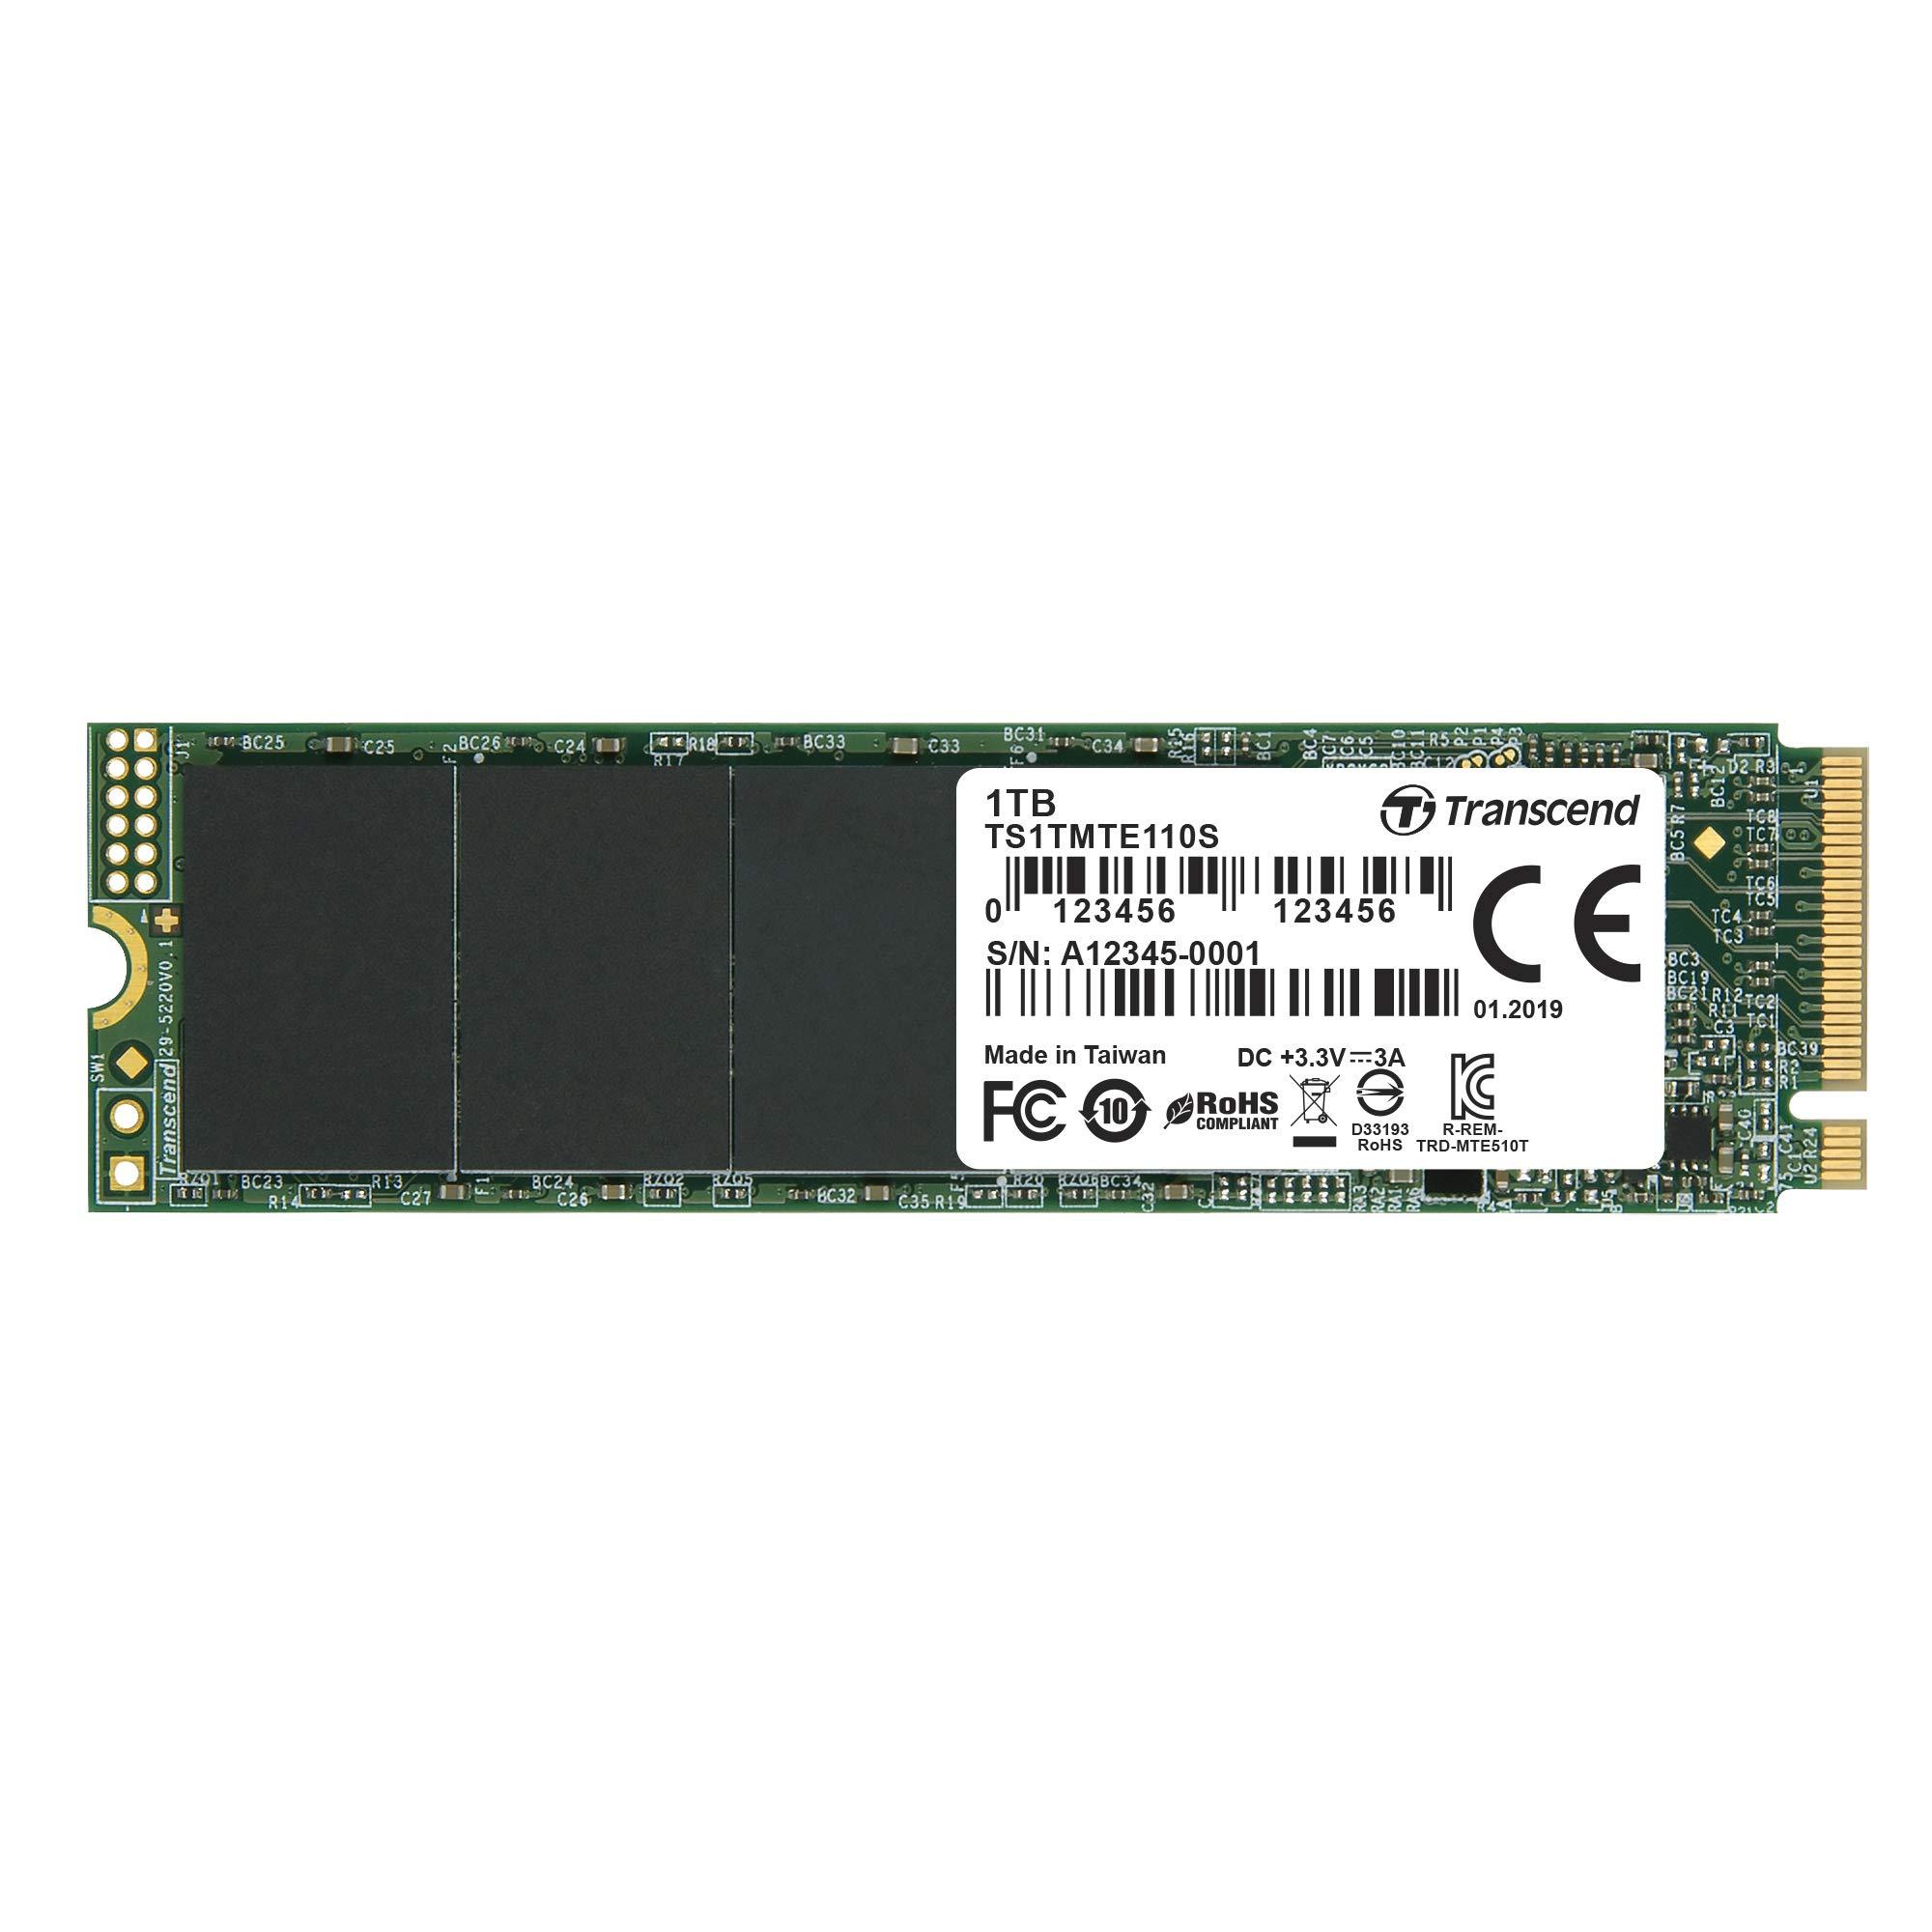 Transcend 1TB NVMe PCIe Gen3 x4 MTE110S M.2 SSD Solid State Drive TS1TMTE110S